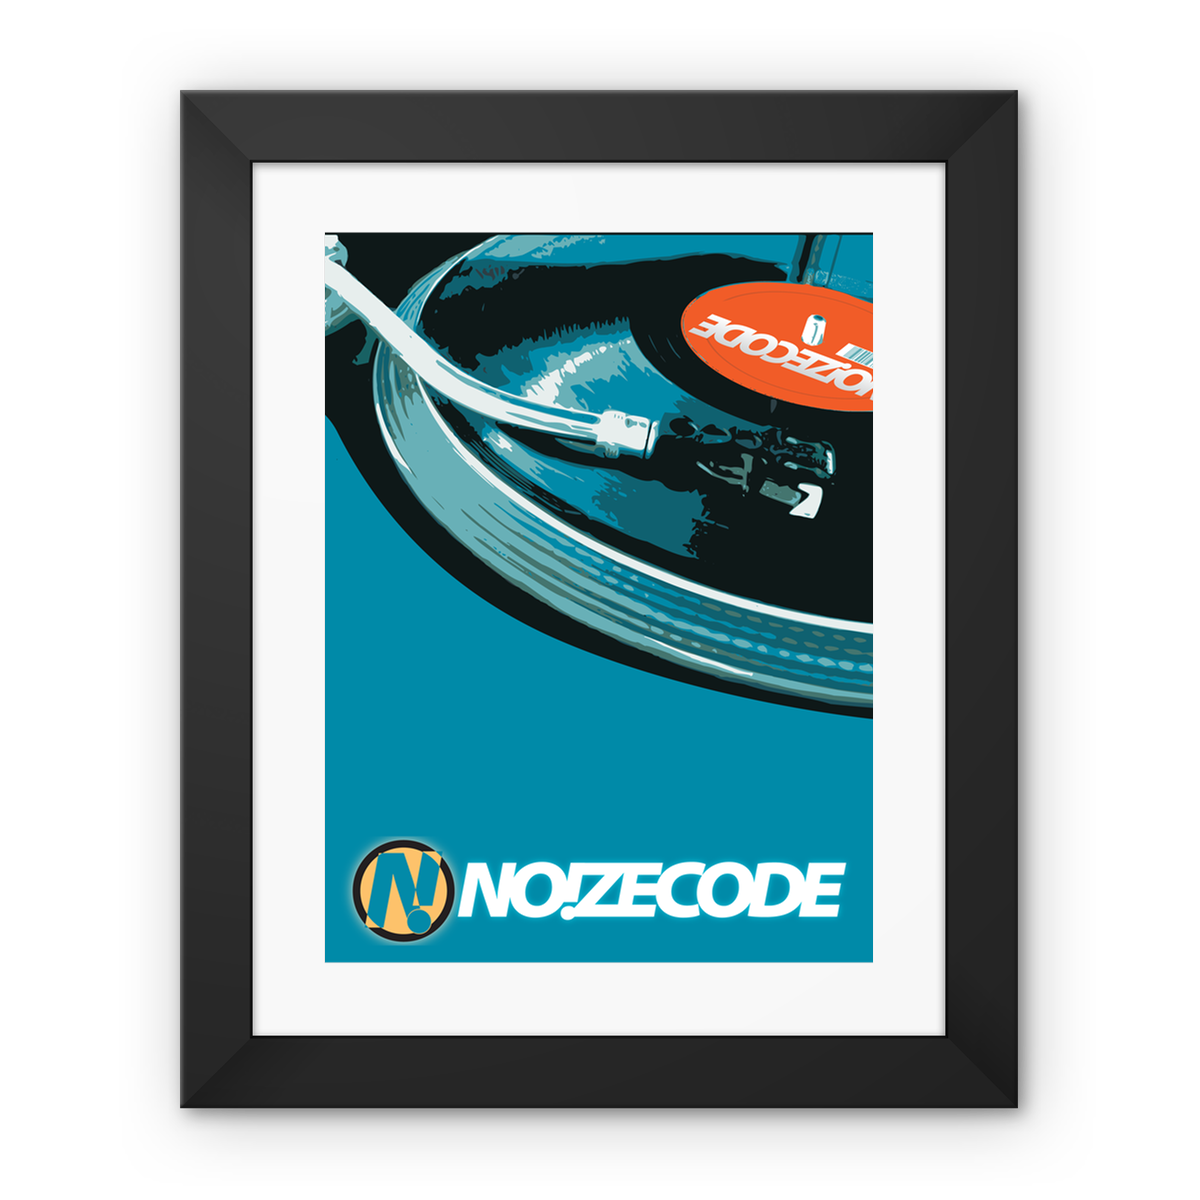 Noizecode Vinyl Framed Fine Art Print – 12″x16″, Black